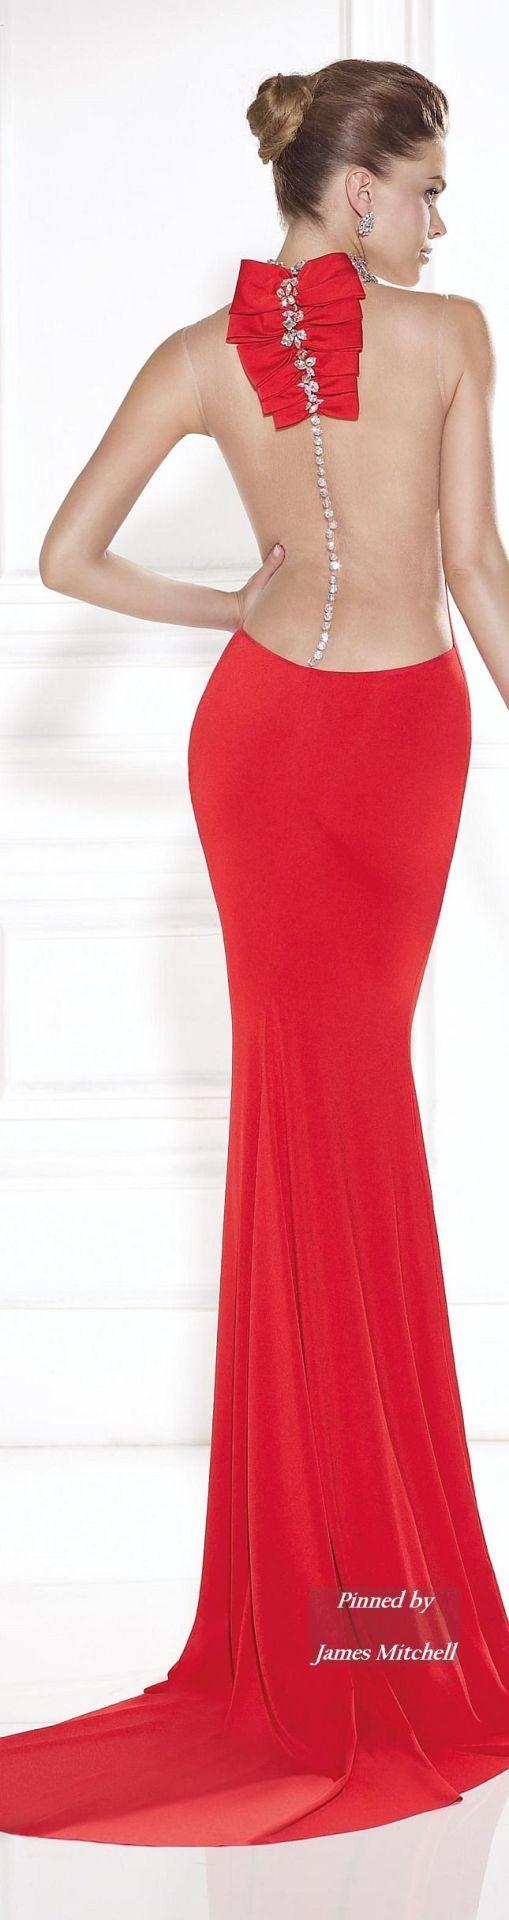 Pin by valeri lera on womenus festive fashion pinterest woman